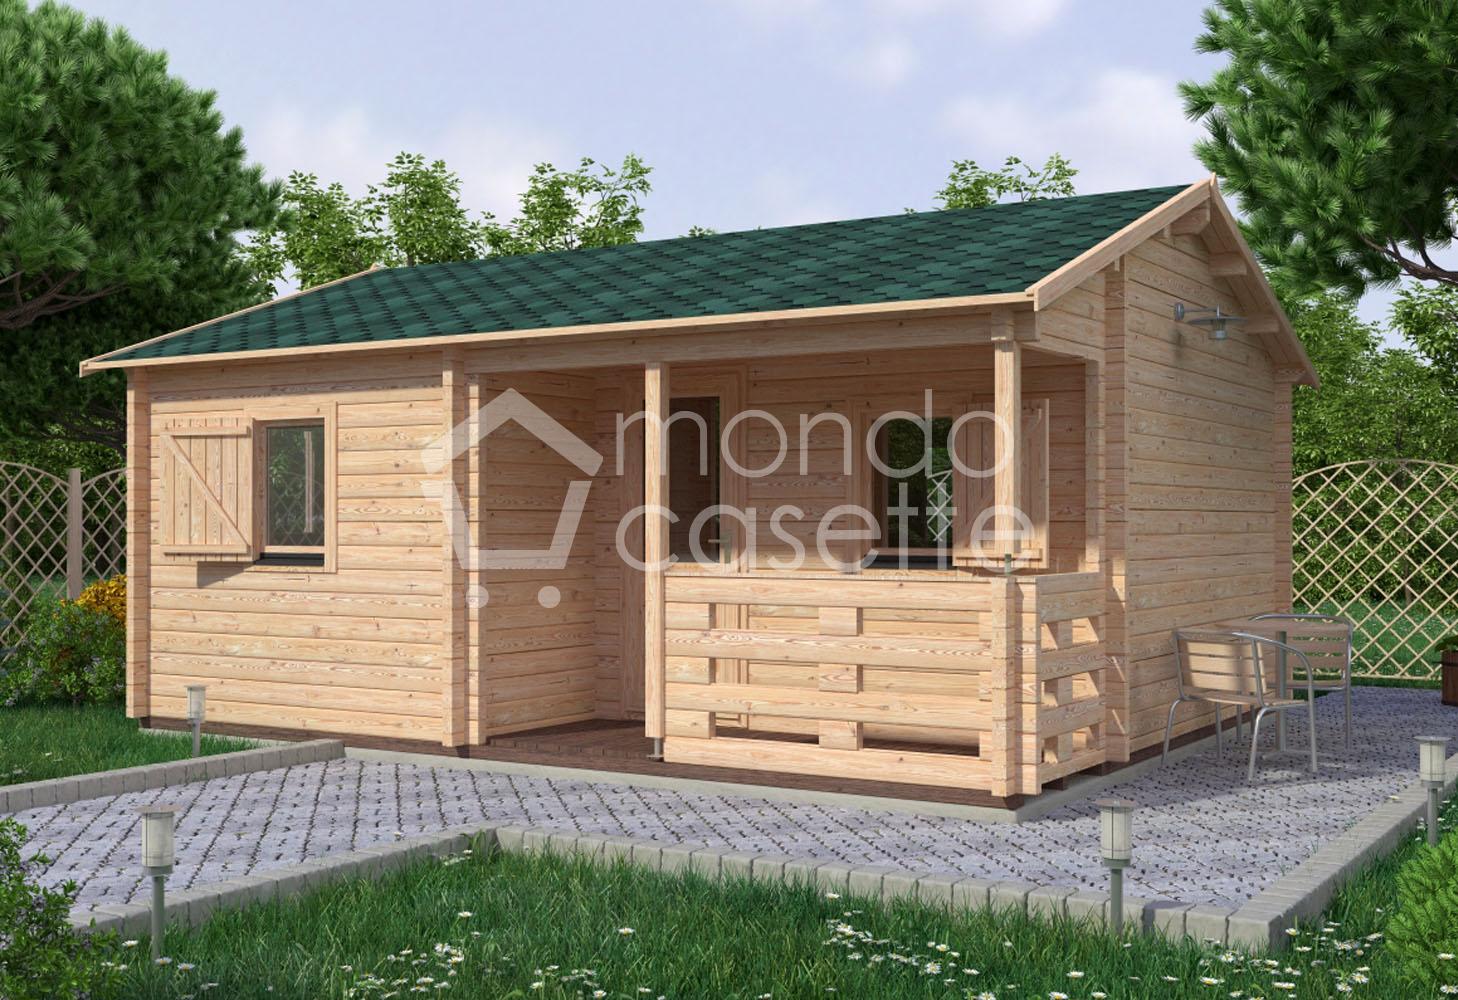 Bungalow casa in legno San - 6,1×4,7 - pareti da 70 mm